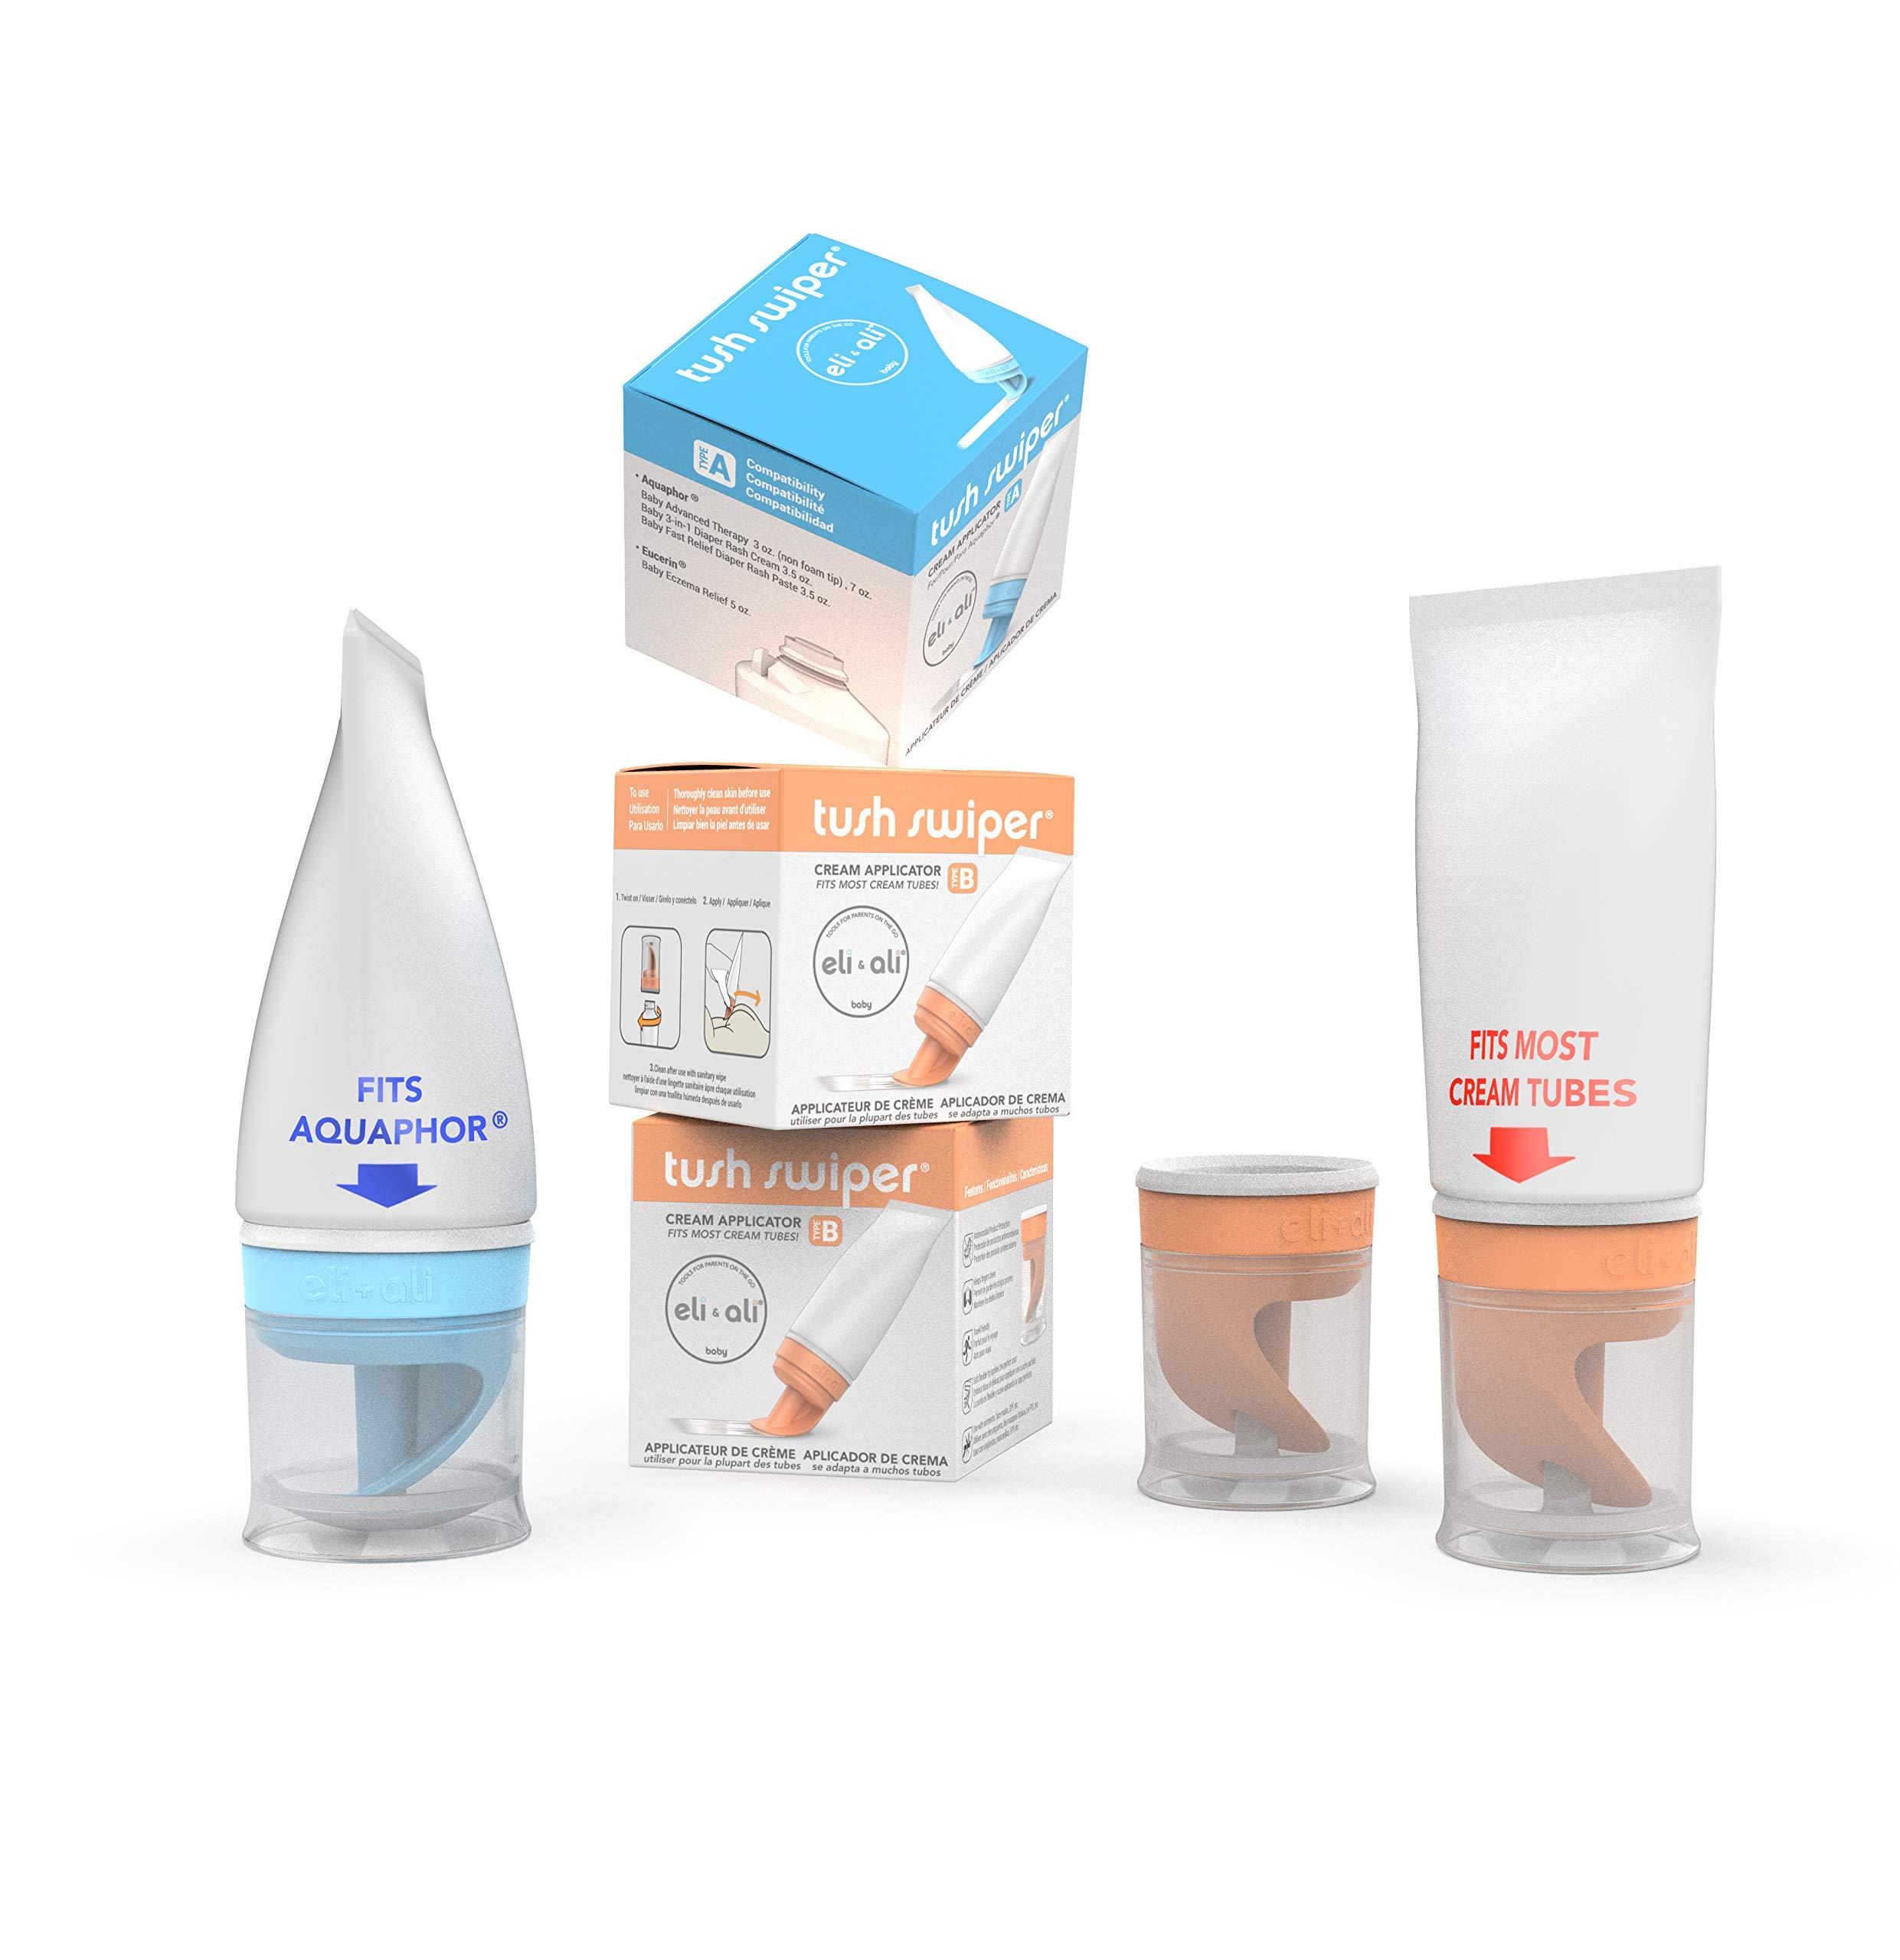 Tush Swiper Diaper Rash Cream Dispenser/Applicator - (3-Pack: Fits Aquaphor x1 + Fits Most x 2)